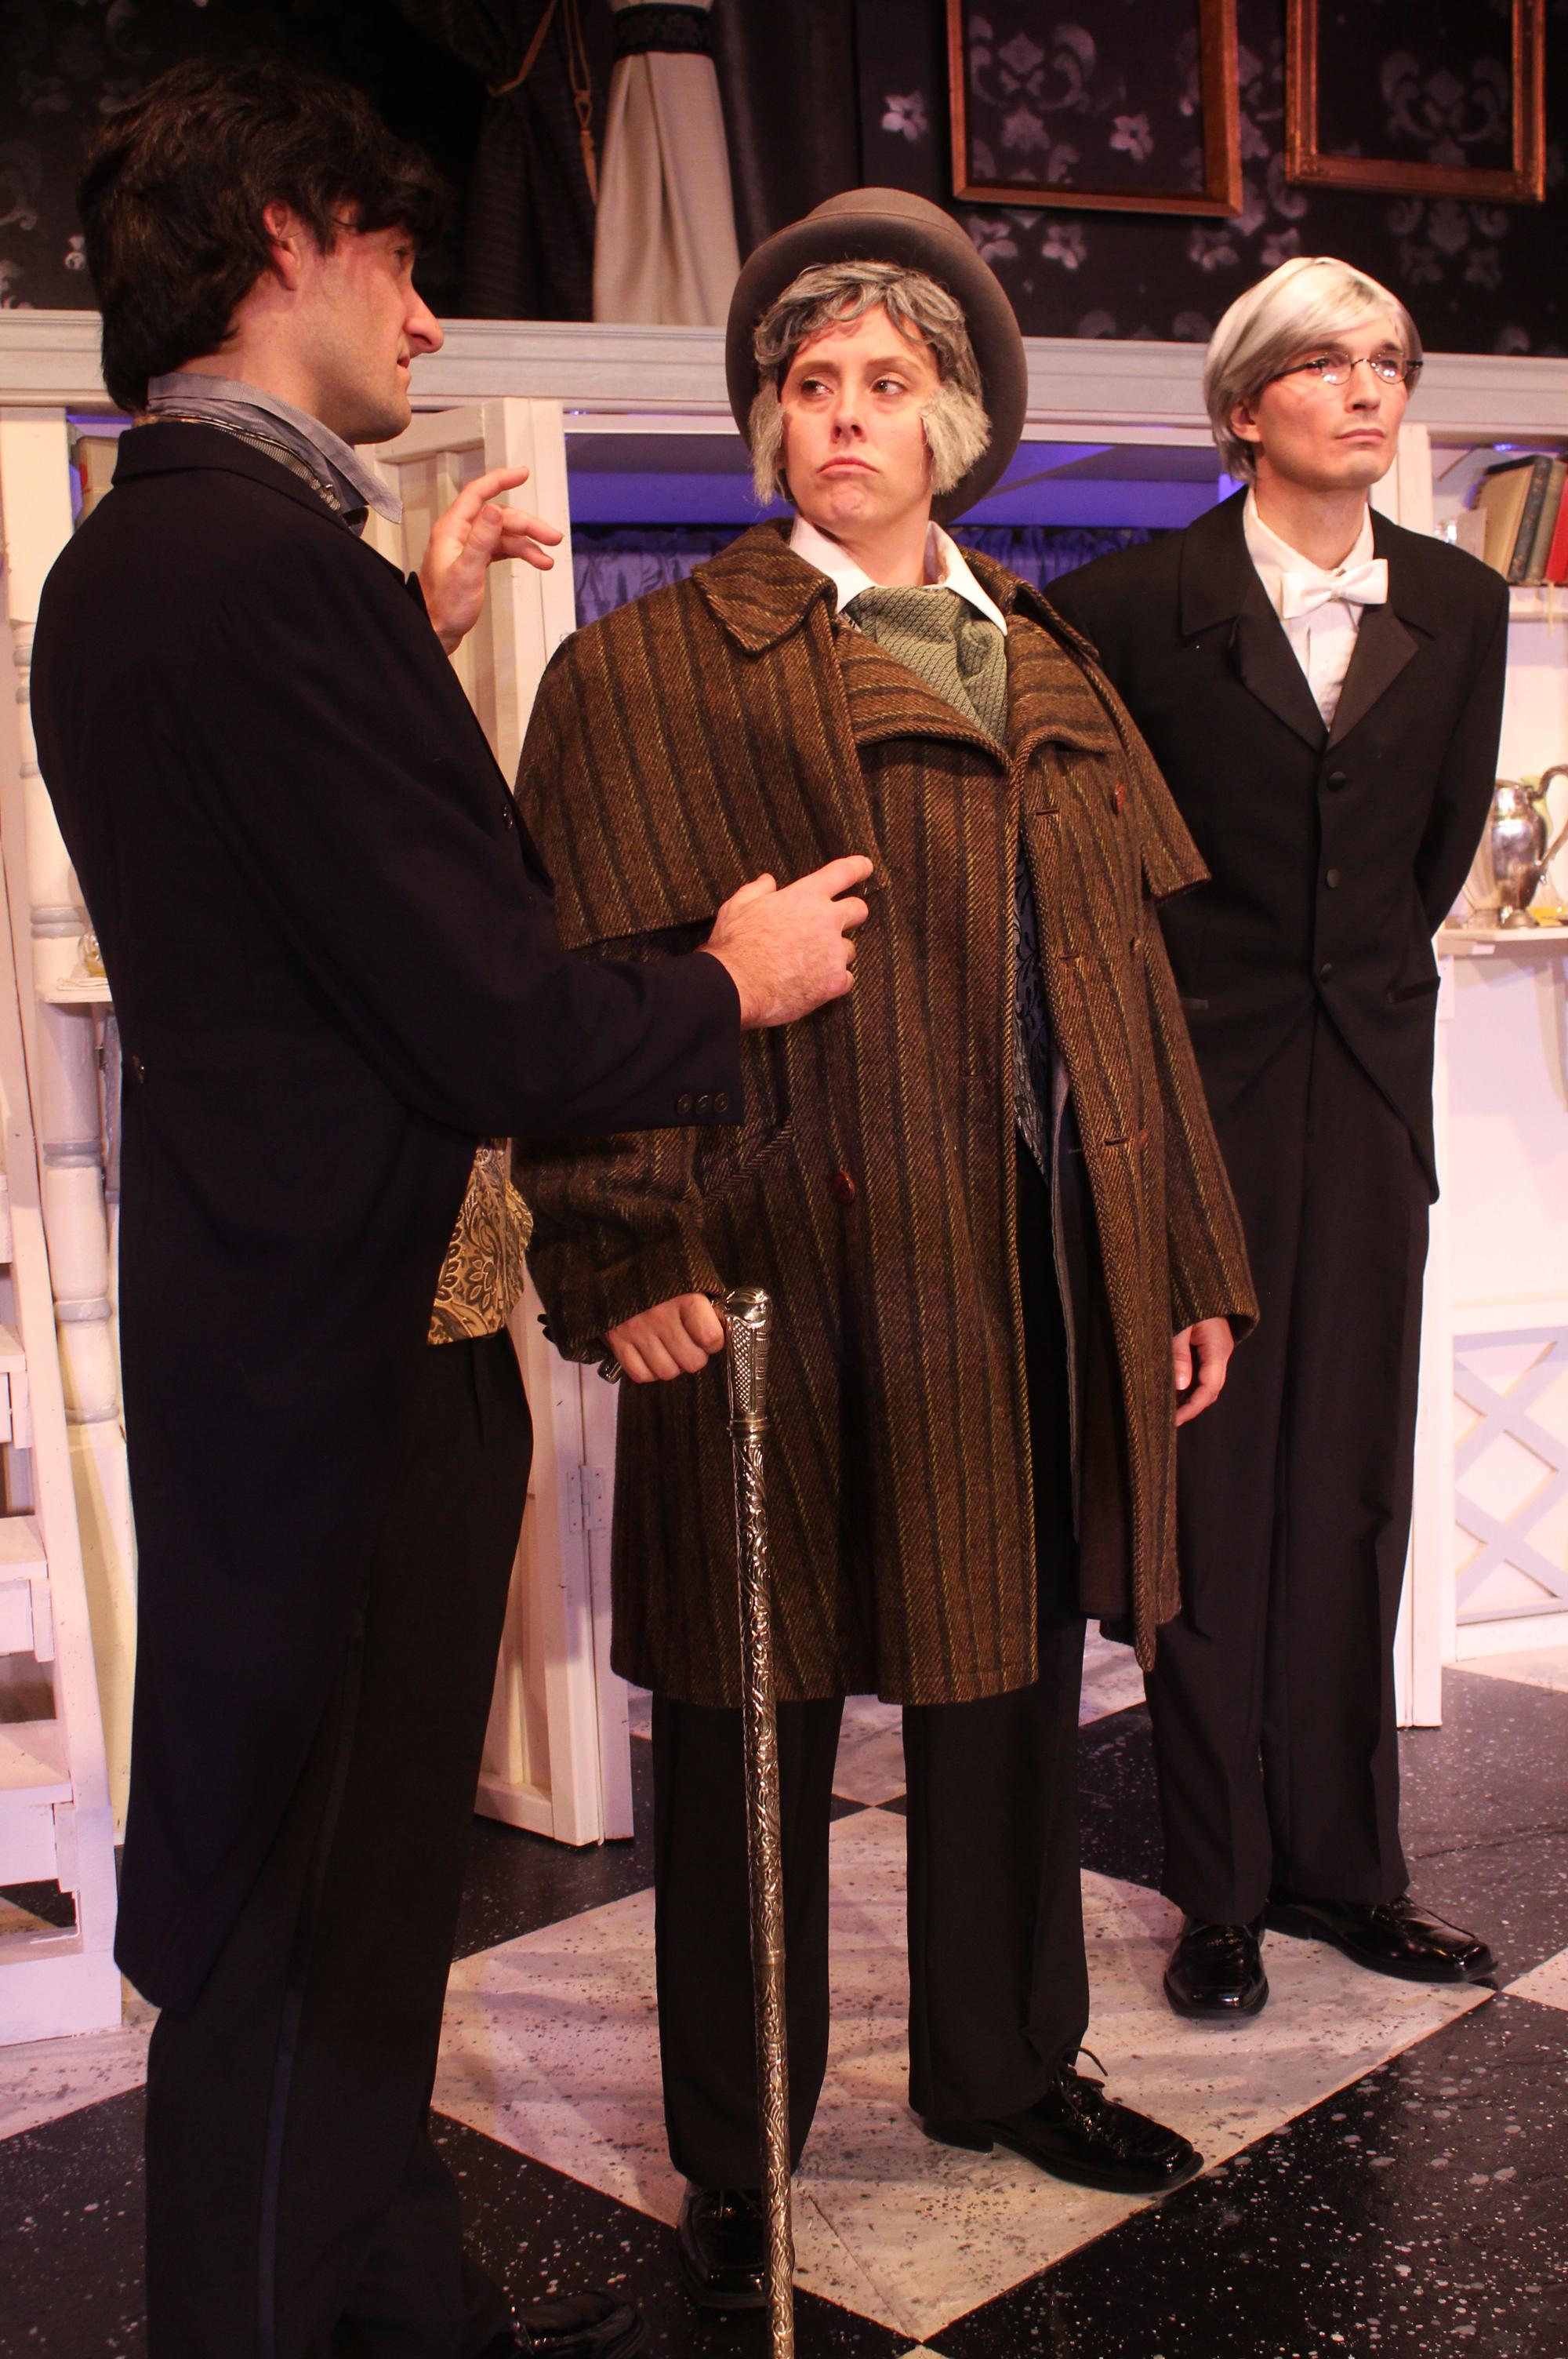 Lord Goring (Ian Potter), Lord Caversham (Tara Herweg-Mann), Phipps (Thomas Weaver)